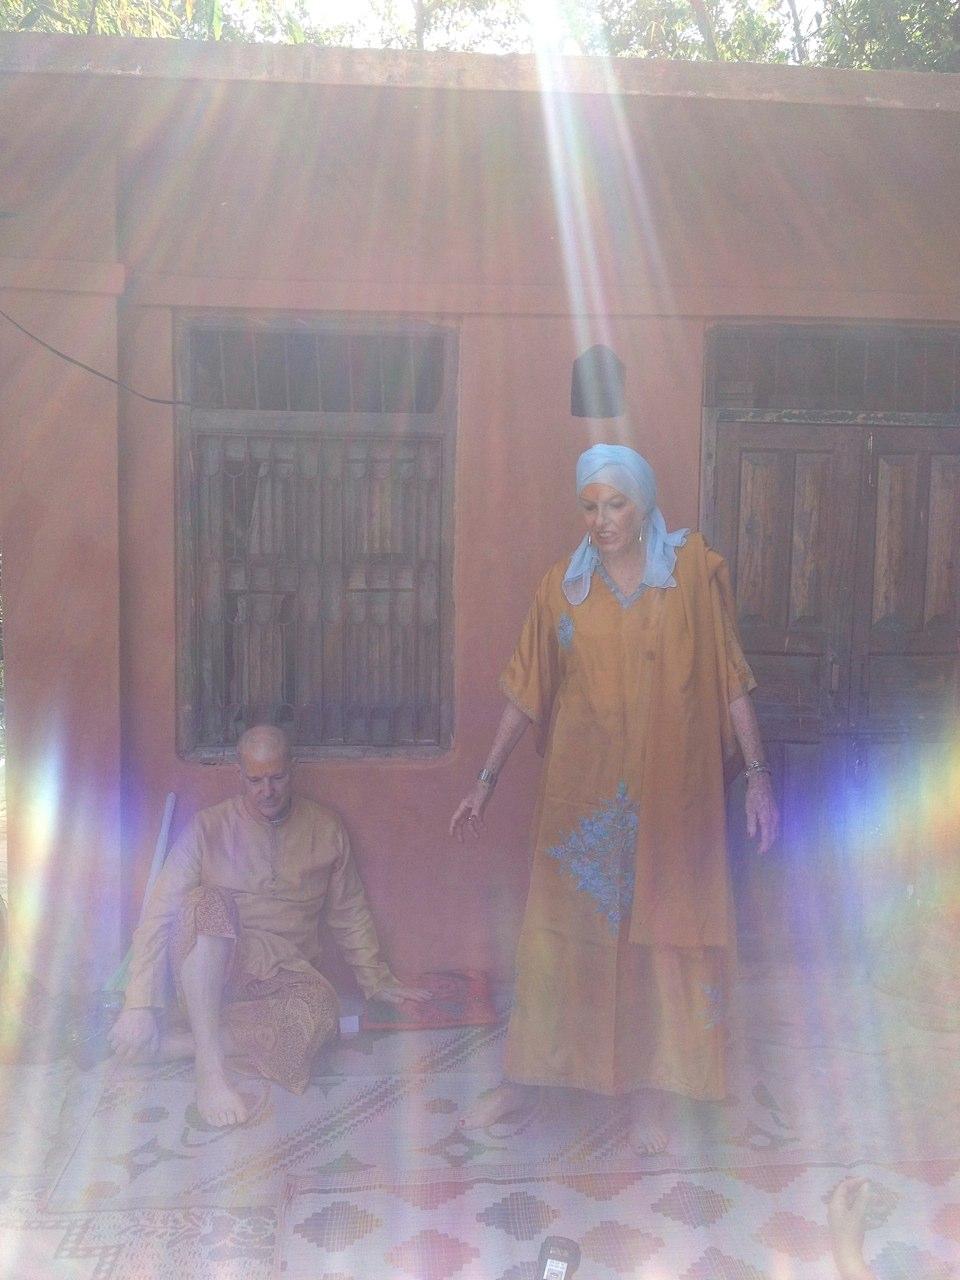 Sondra Ray speaking at the ashram